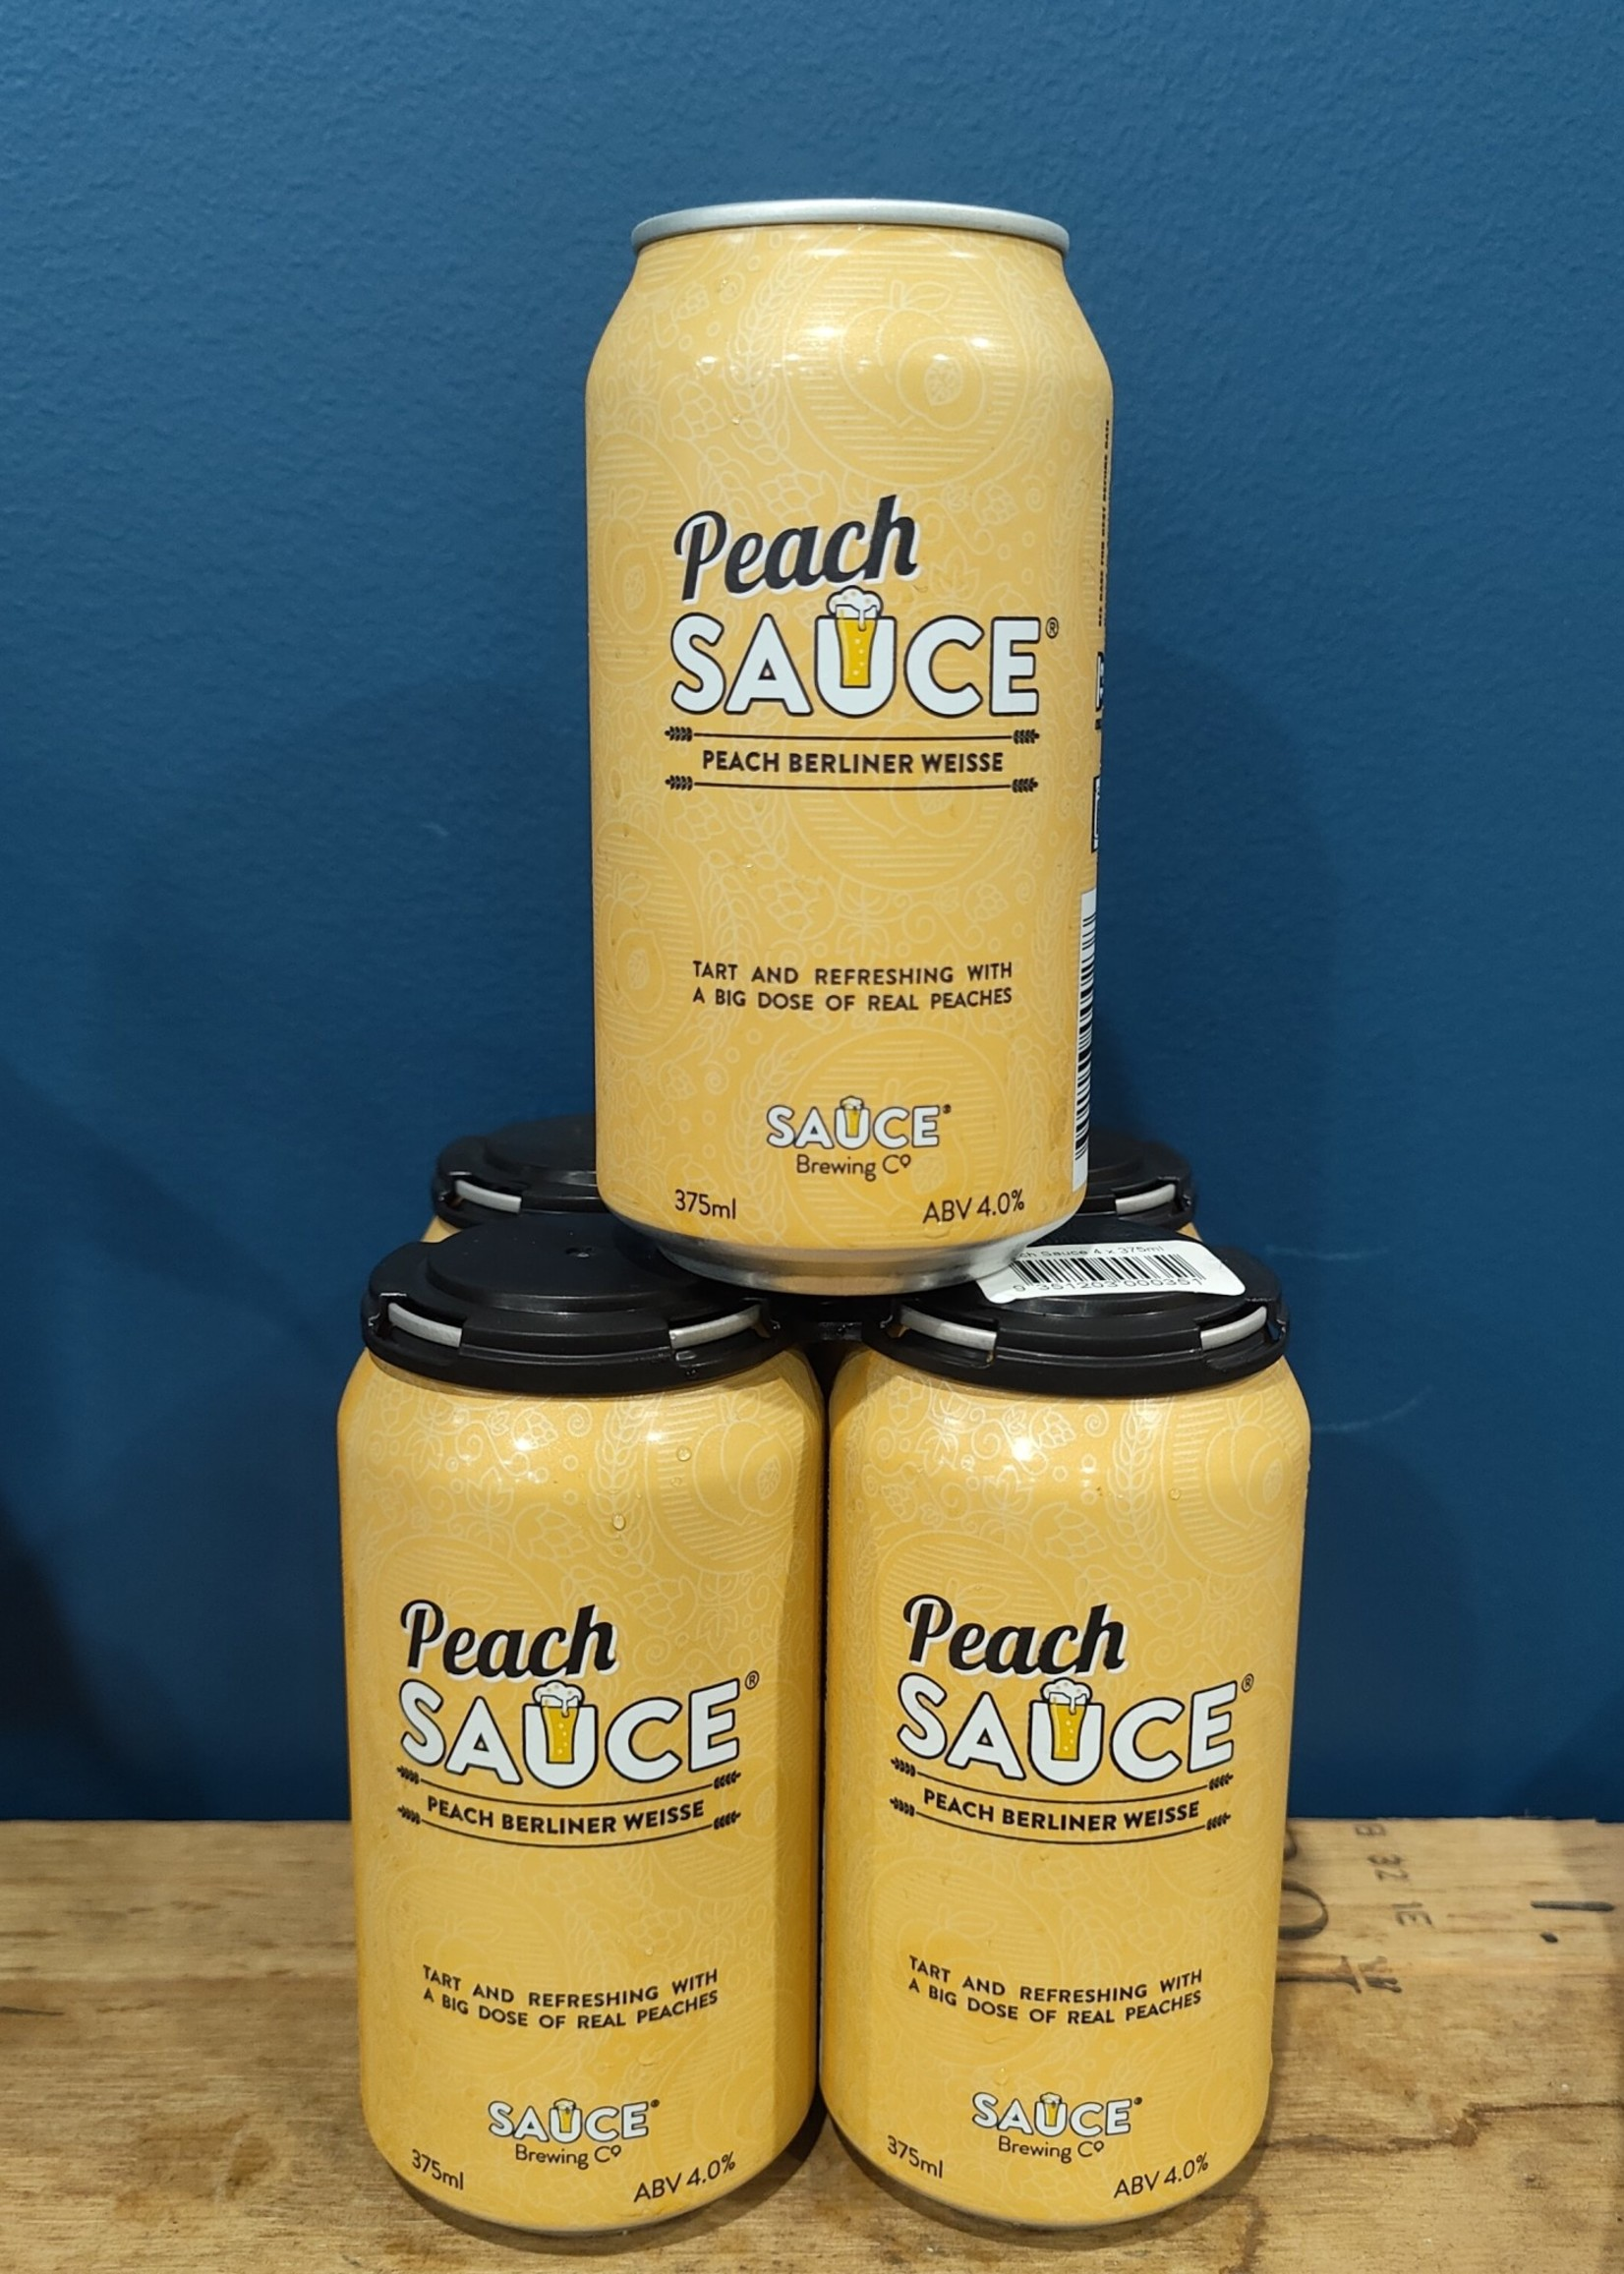 Sauce Peach Sauce